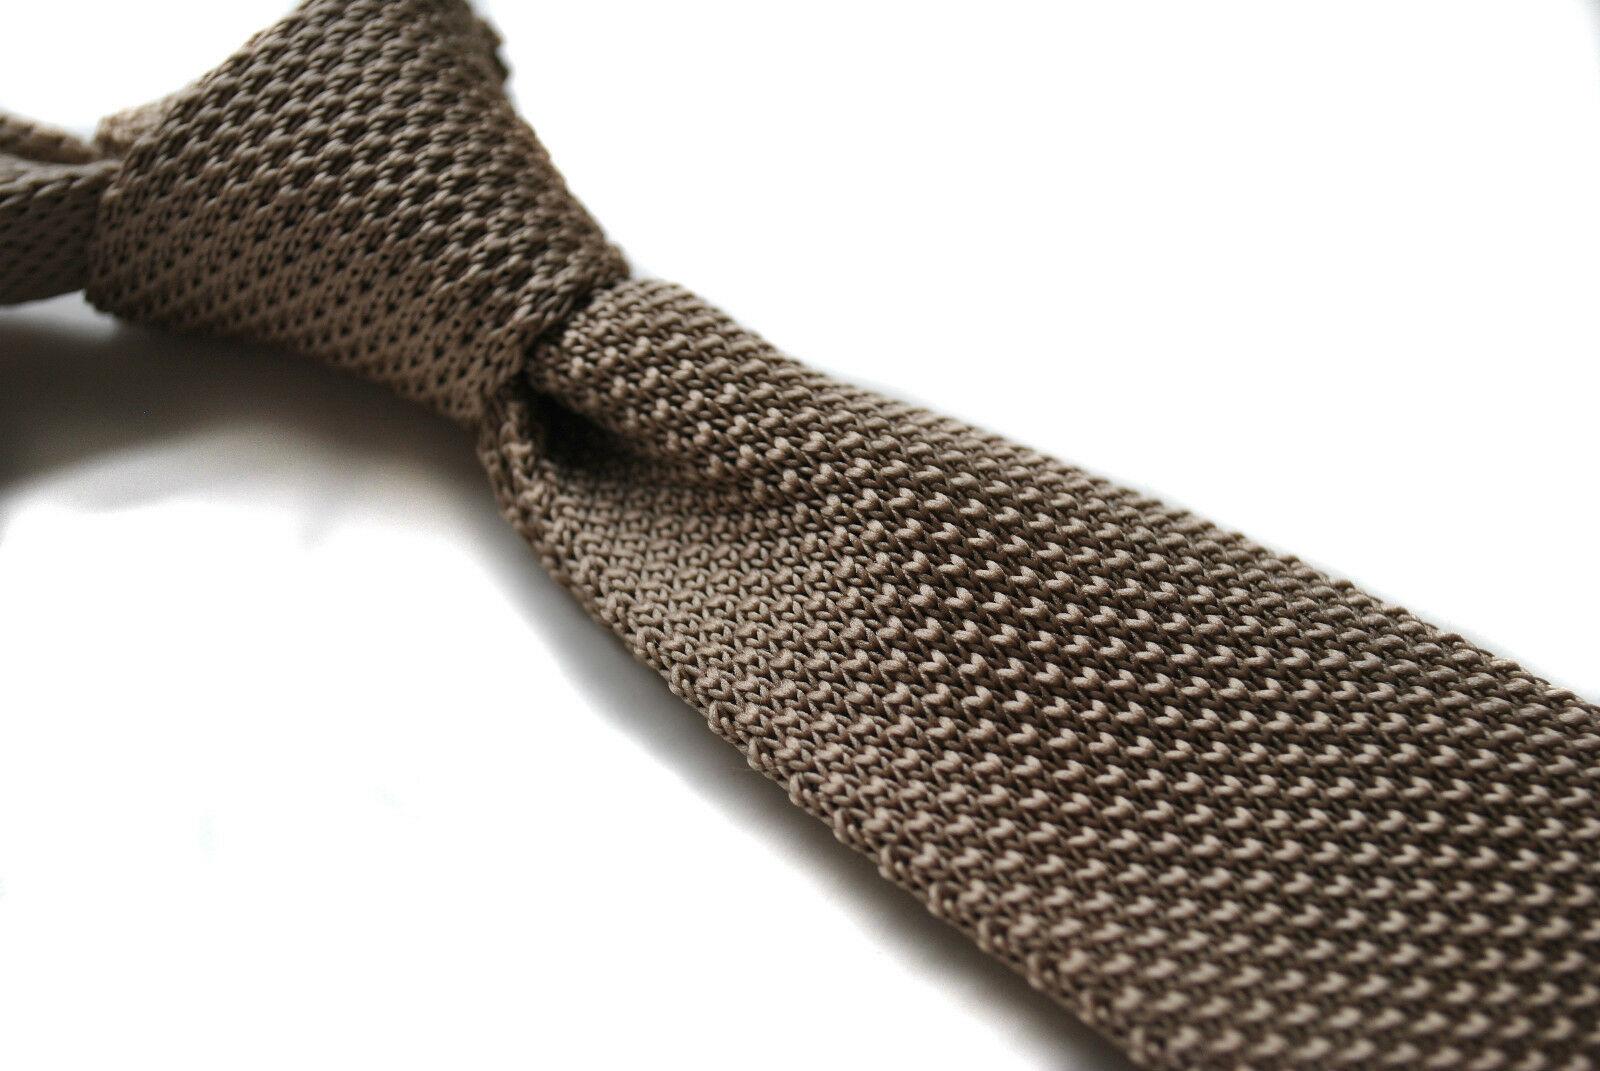 Frederick Thomas Knitted Silk Mens Tie - Beige / Tan - Plain Wedding Neck Tie